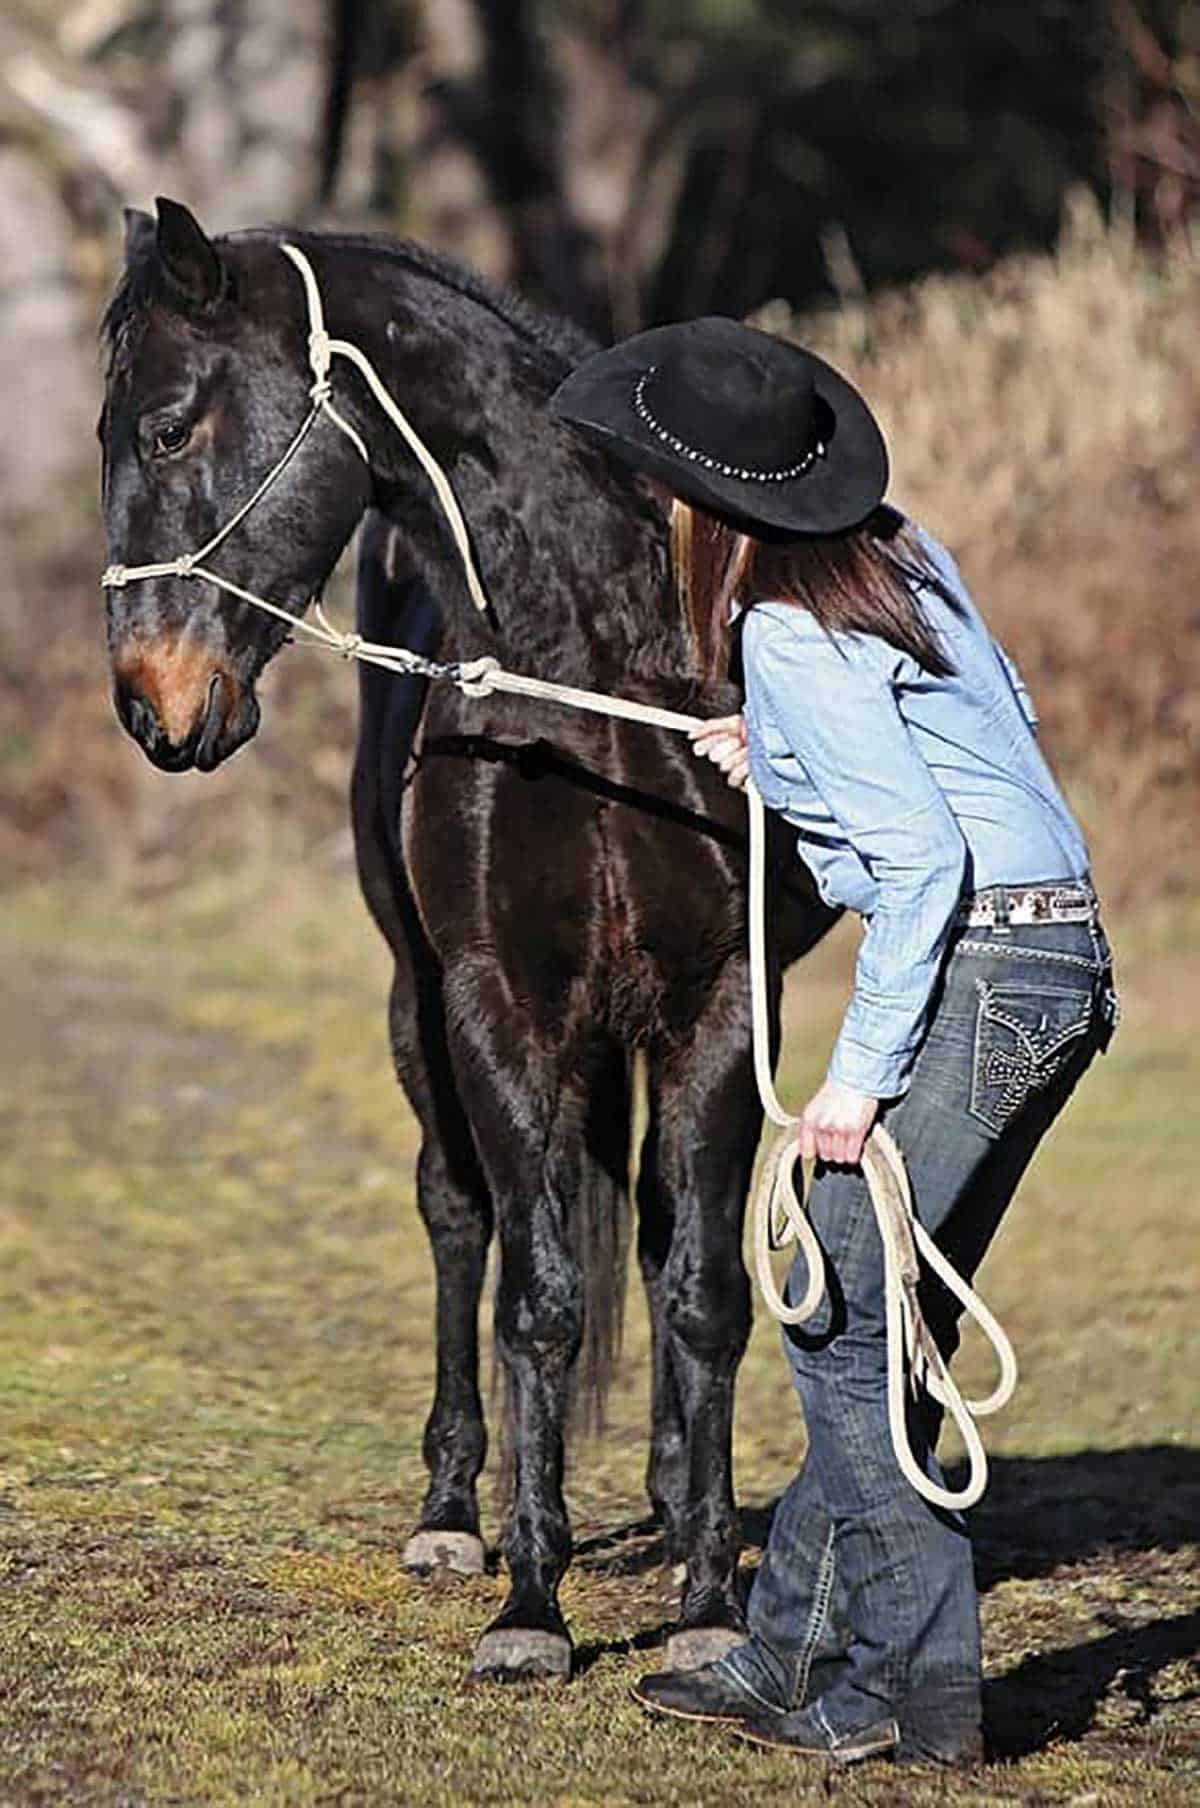 bad-horse-relationship-1-1